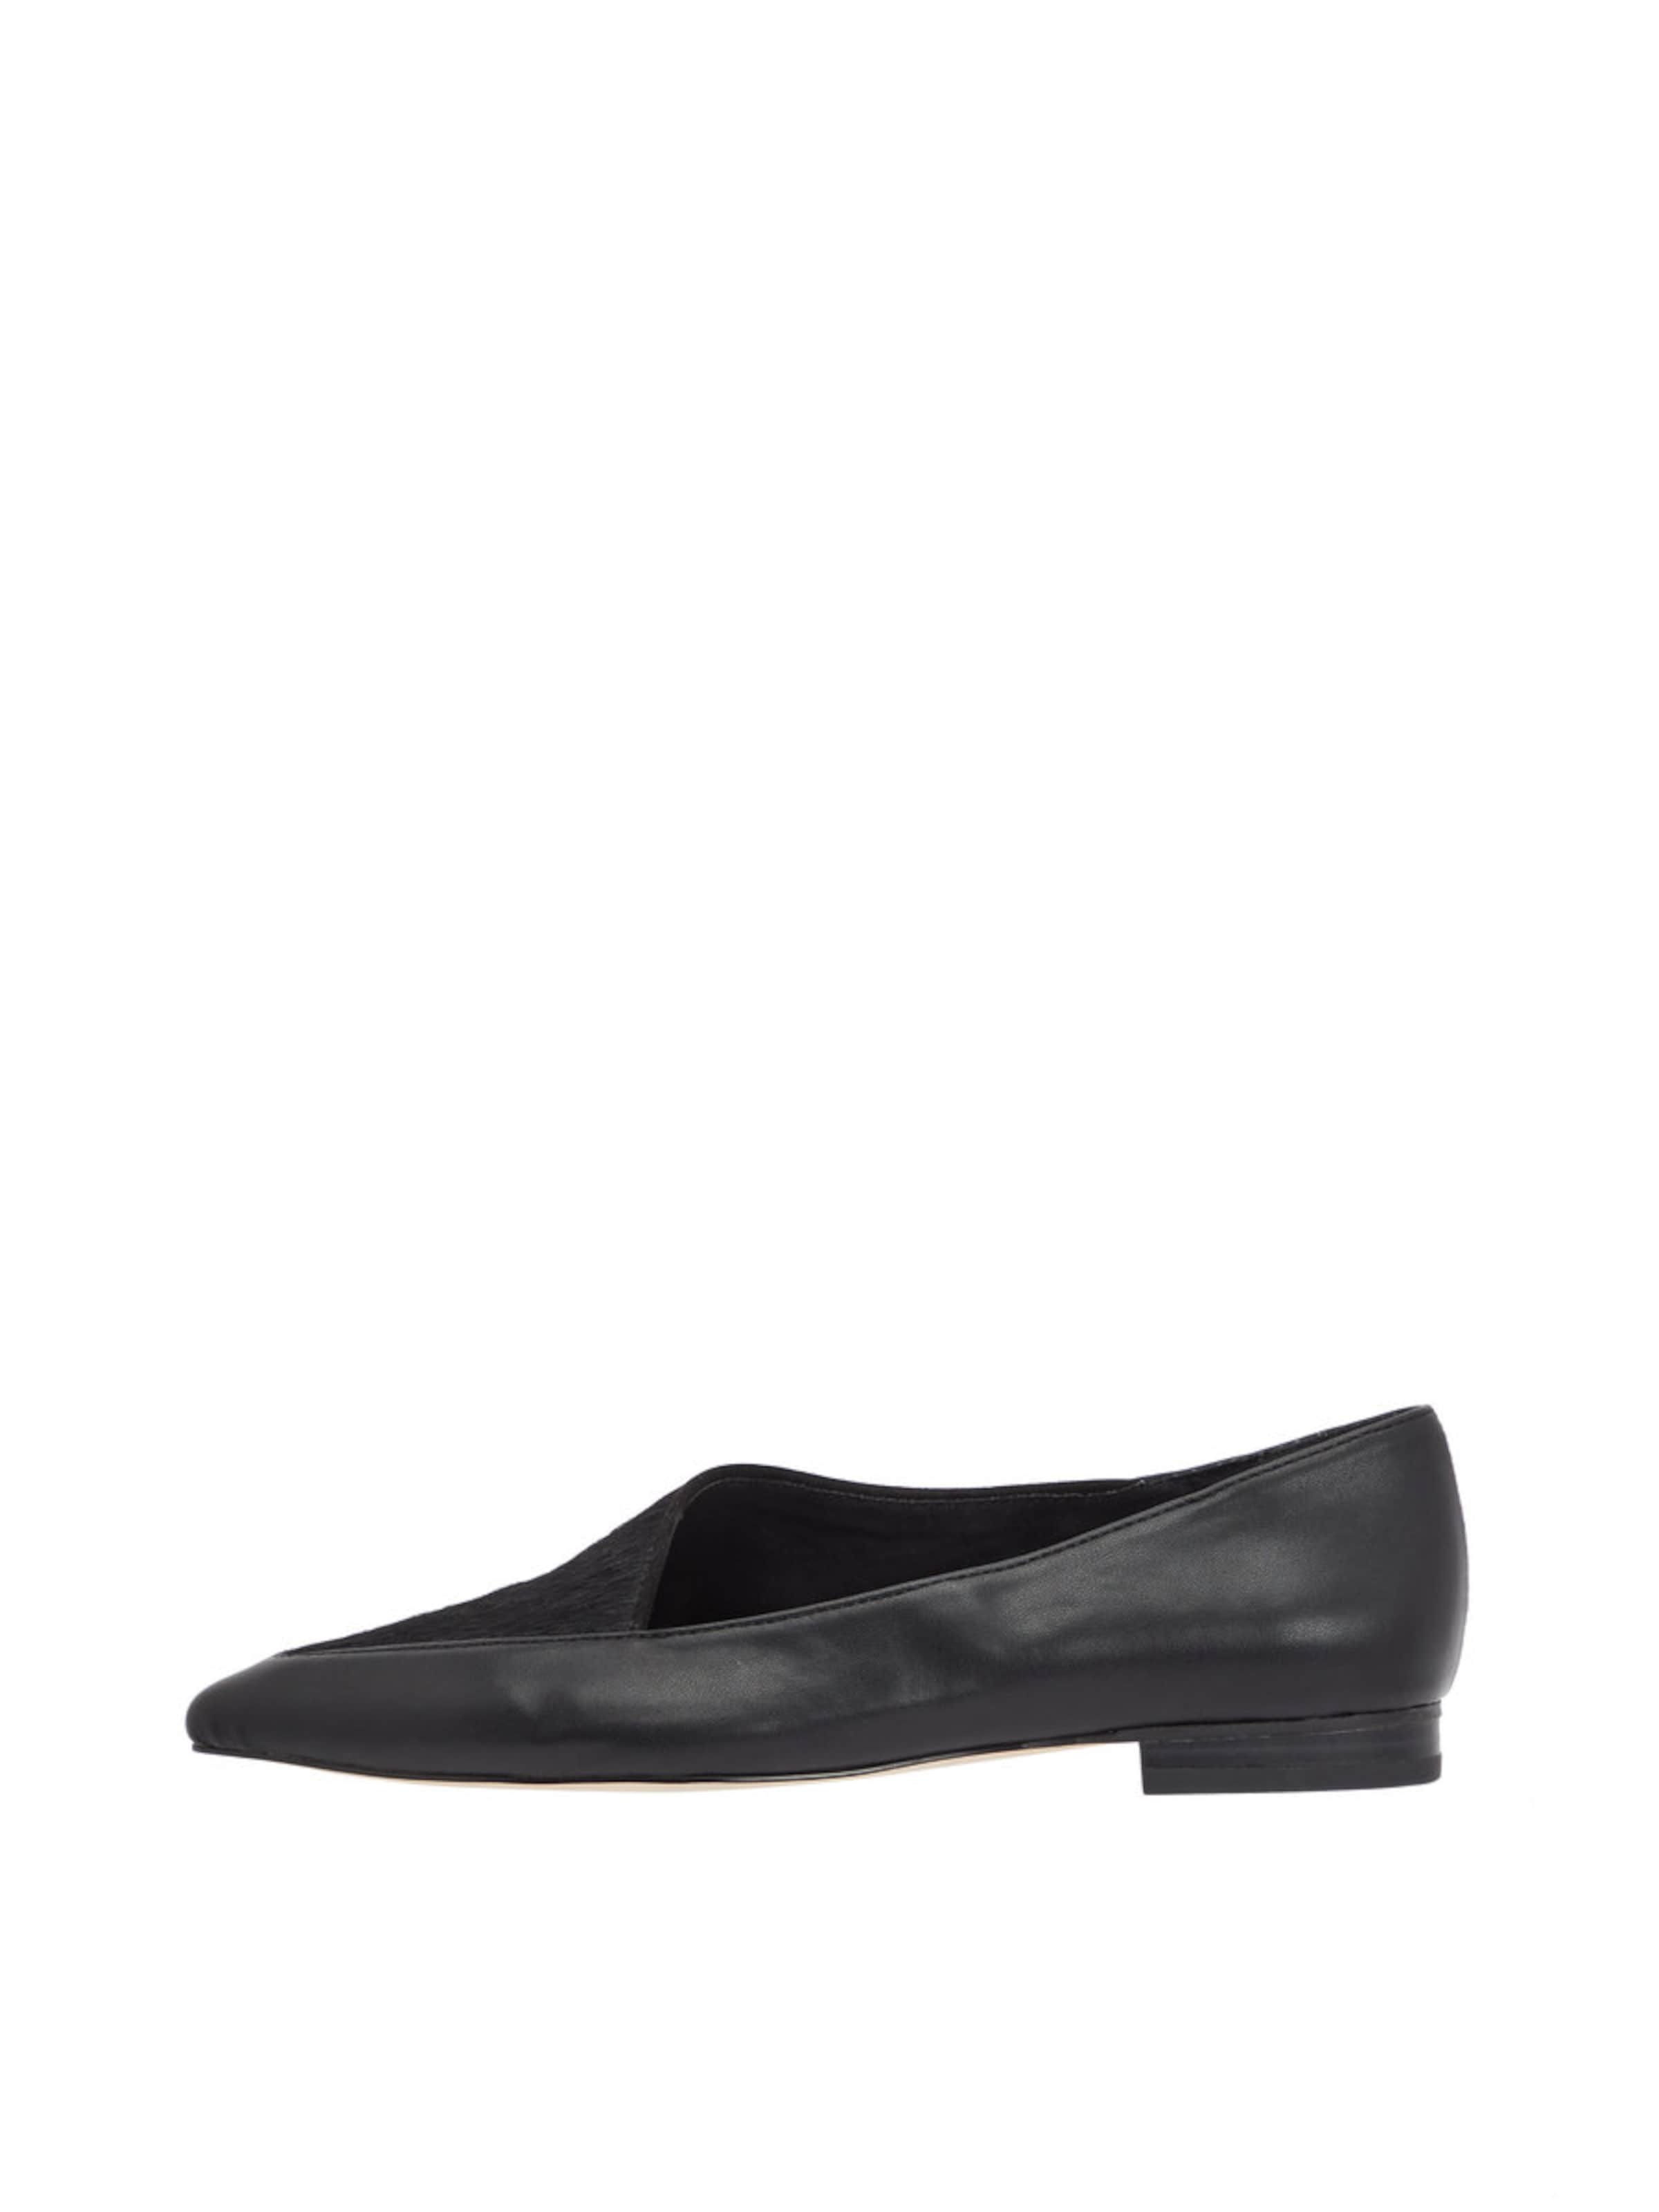 Haltbare Mode billige Schuhe Bianco   Ballerinas Schuhe Gut getragene Schuhe